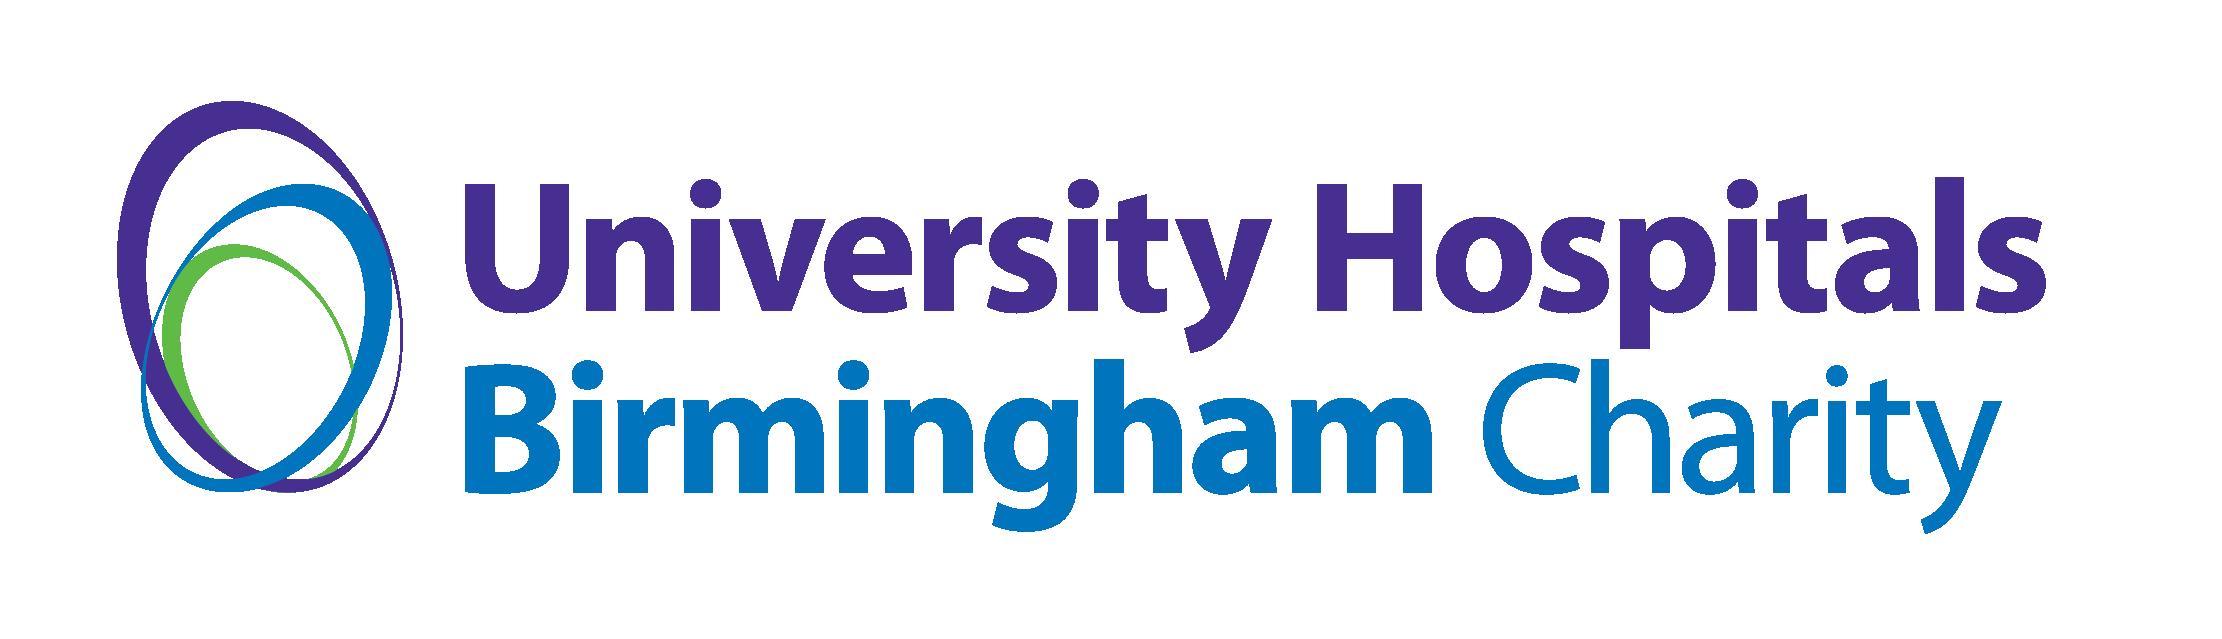 university_hospitals_birmingham_charity_landscape_rgb.png